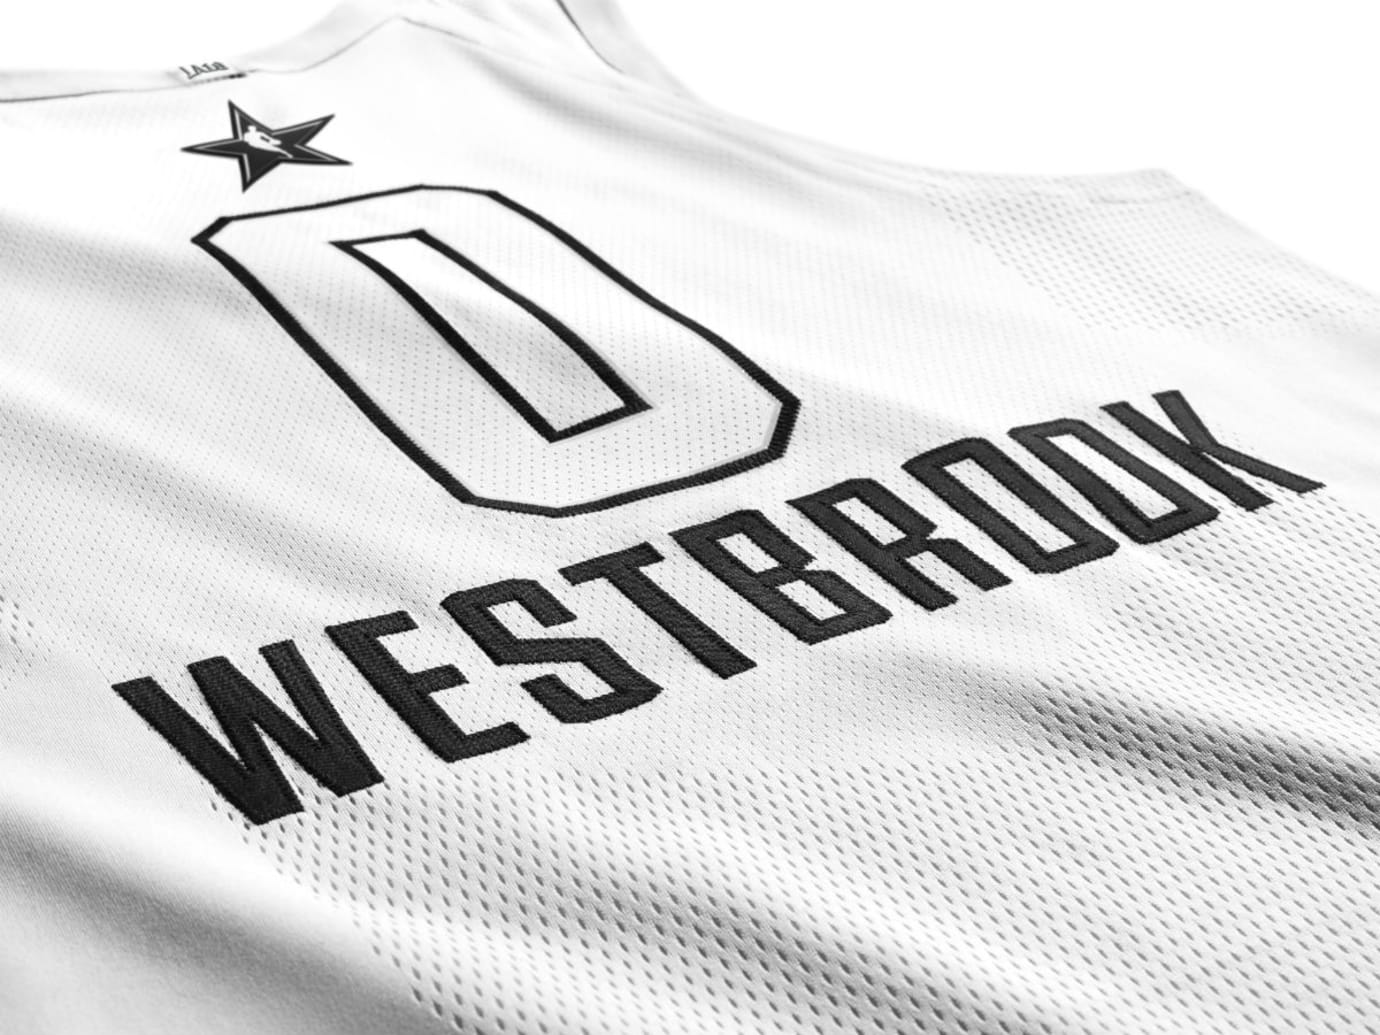 Jordan Brand 2018 NBA All-Star Jerseys Westbrook Name